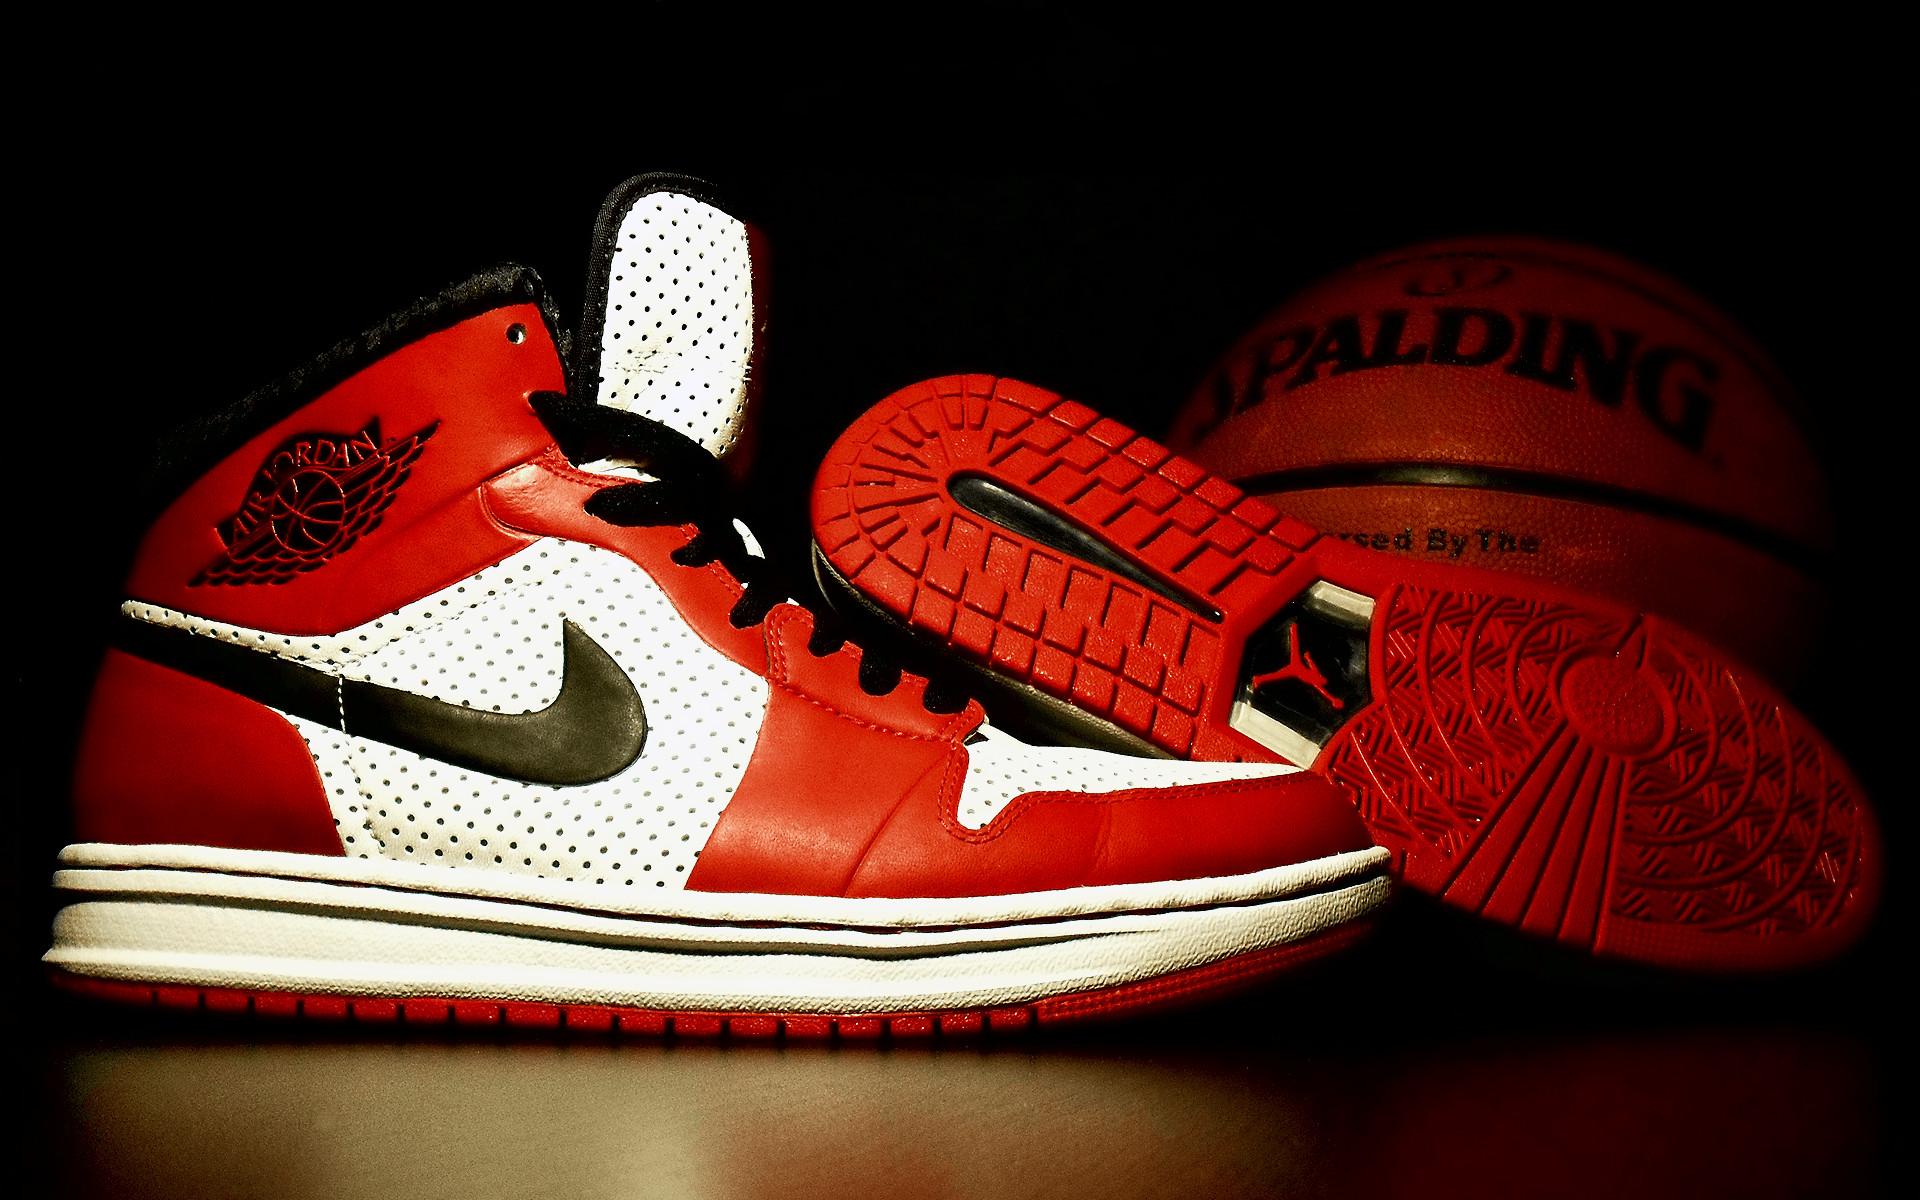 Res: 1920x1200, Download Free Air Jordan Shoes Wallpapers | HD Wallpapers .